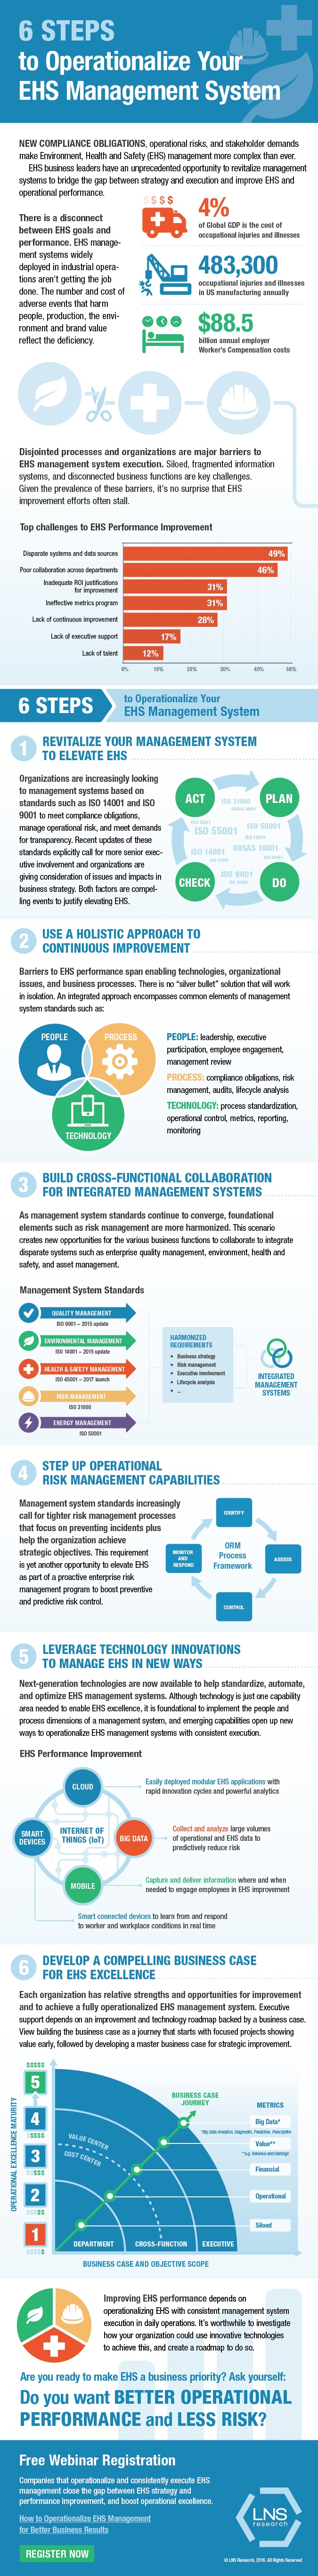 LNS_OperationalizingEHSManagement_Webcast.jpg